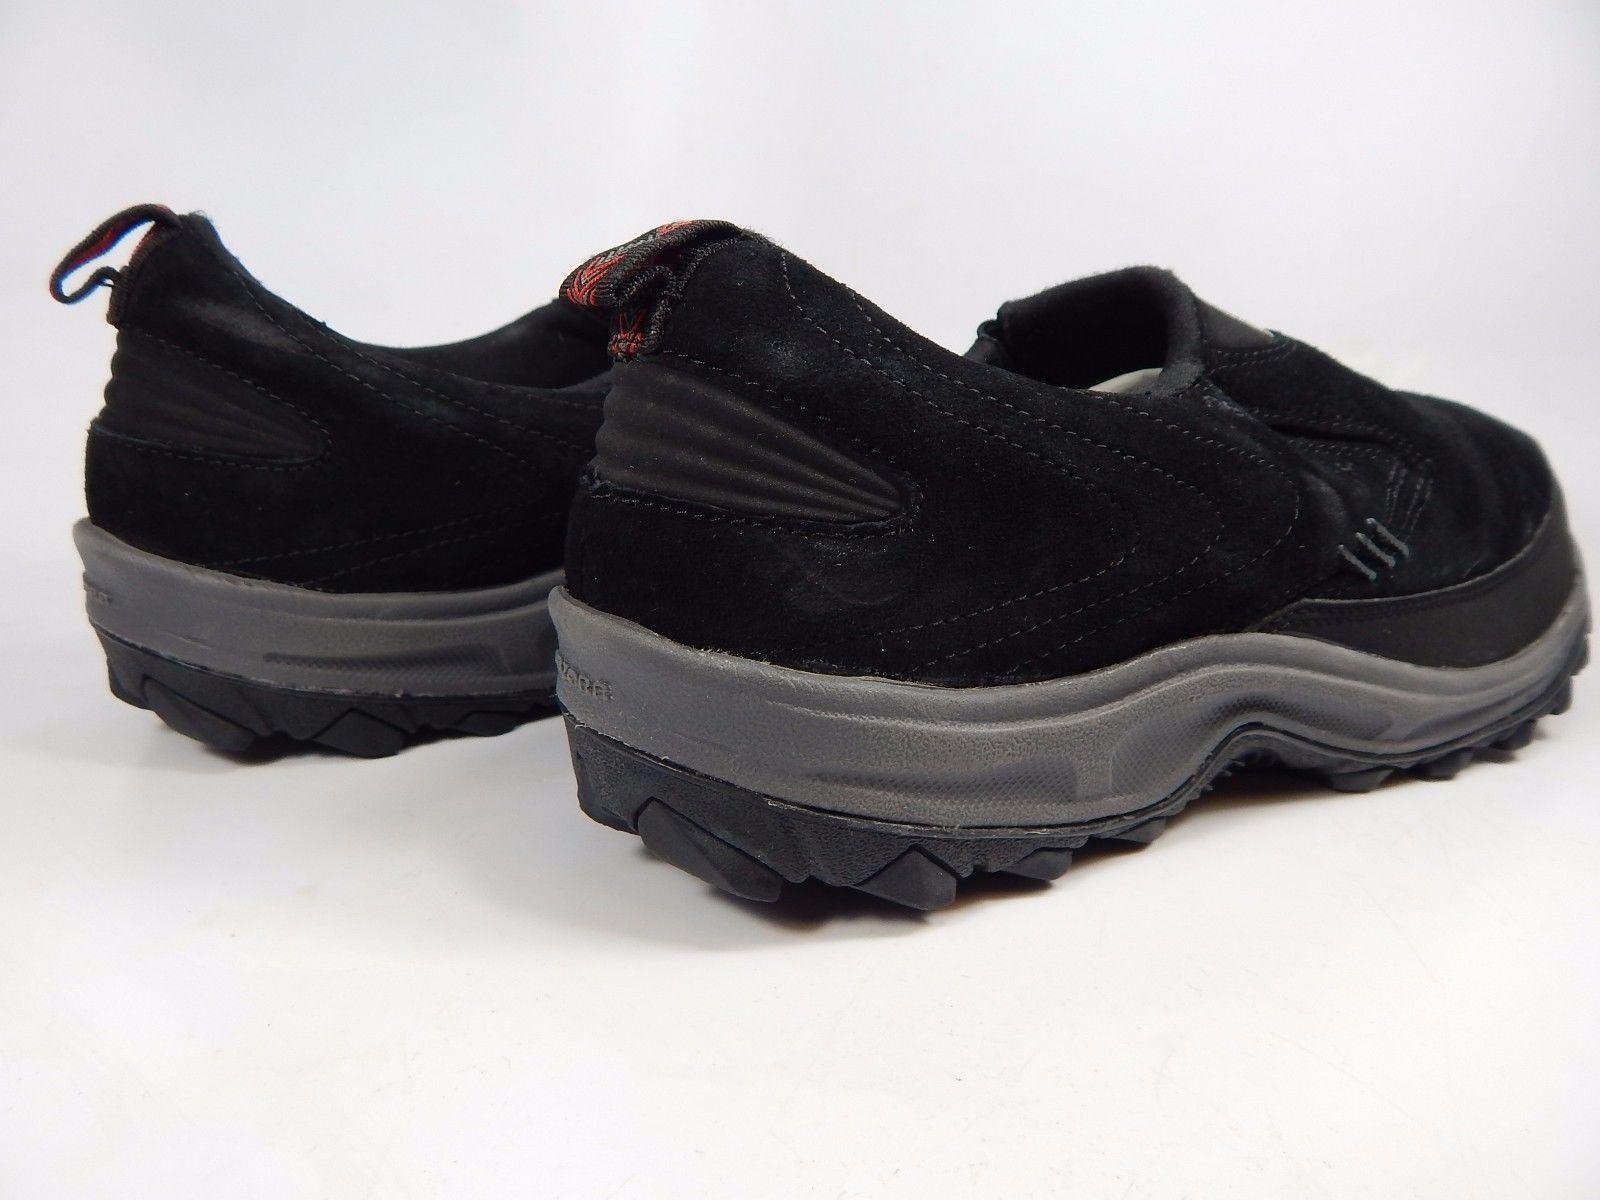 New Balance 756 v2 Men's Slip On Country Walking Shoes Size US 9 M (D) EU 42.5